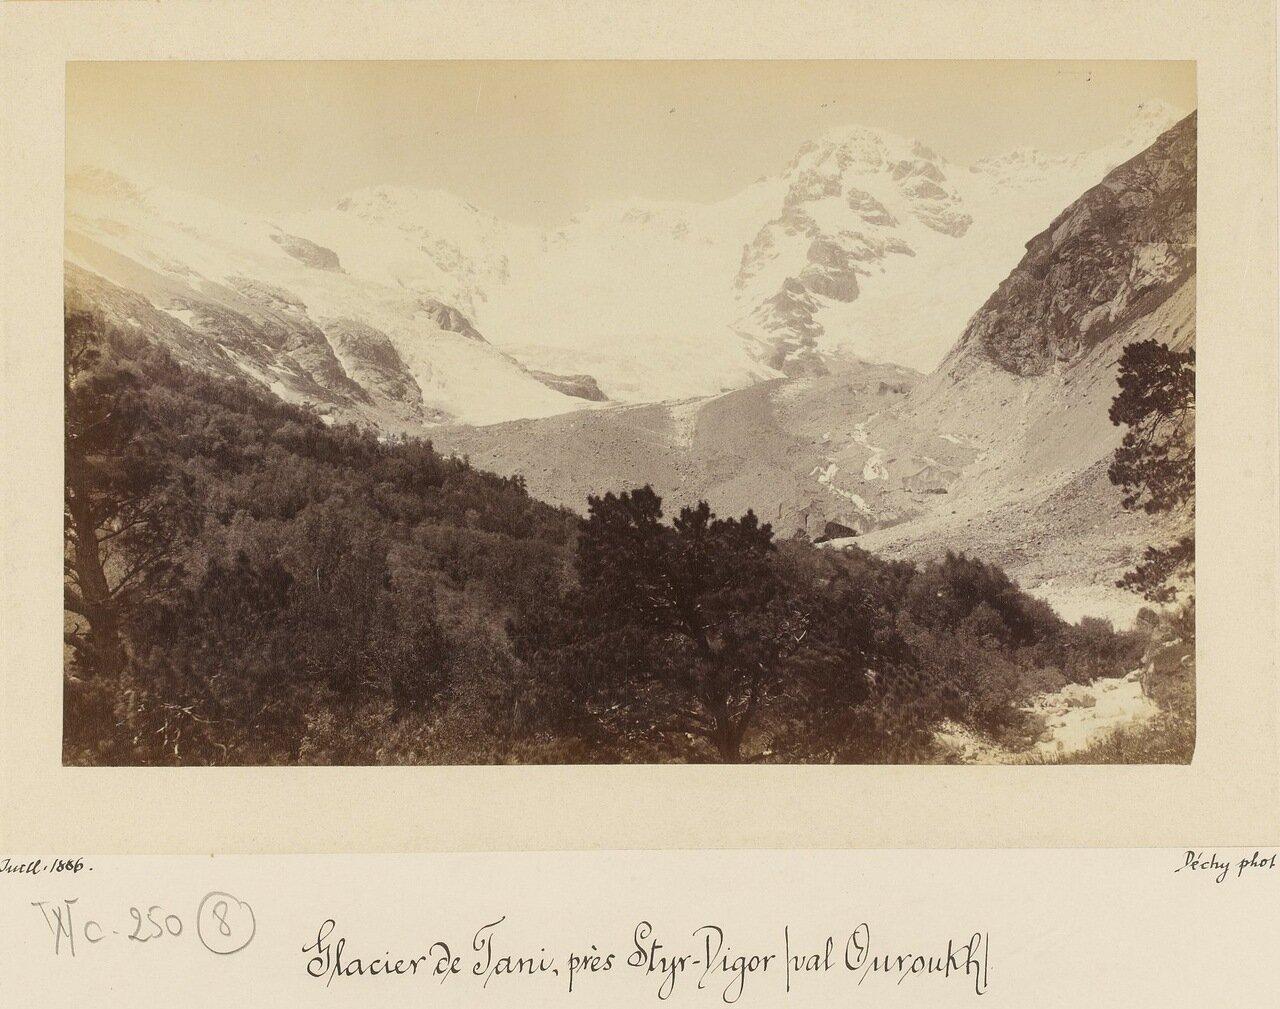 Ледник вблизи Стыр-Дигора